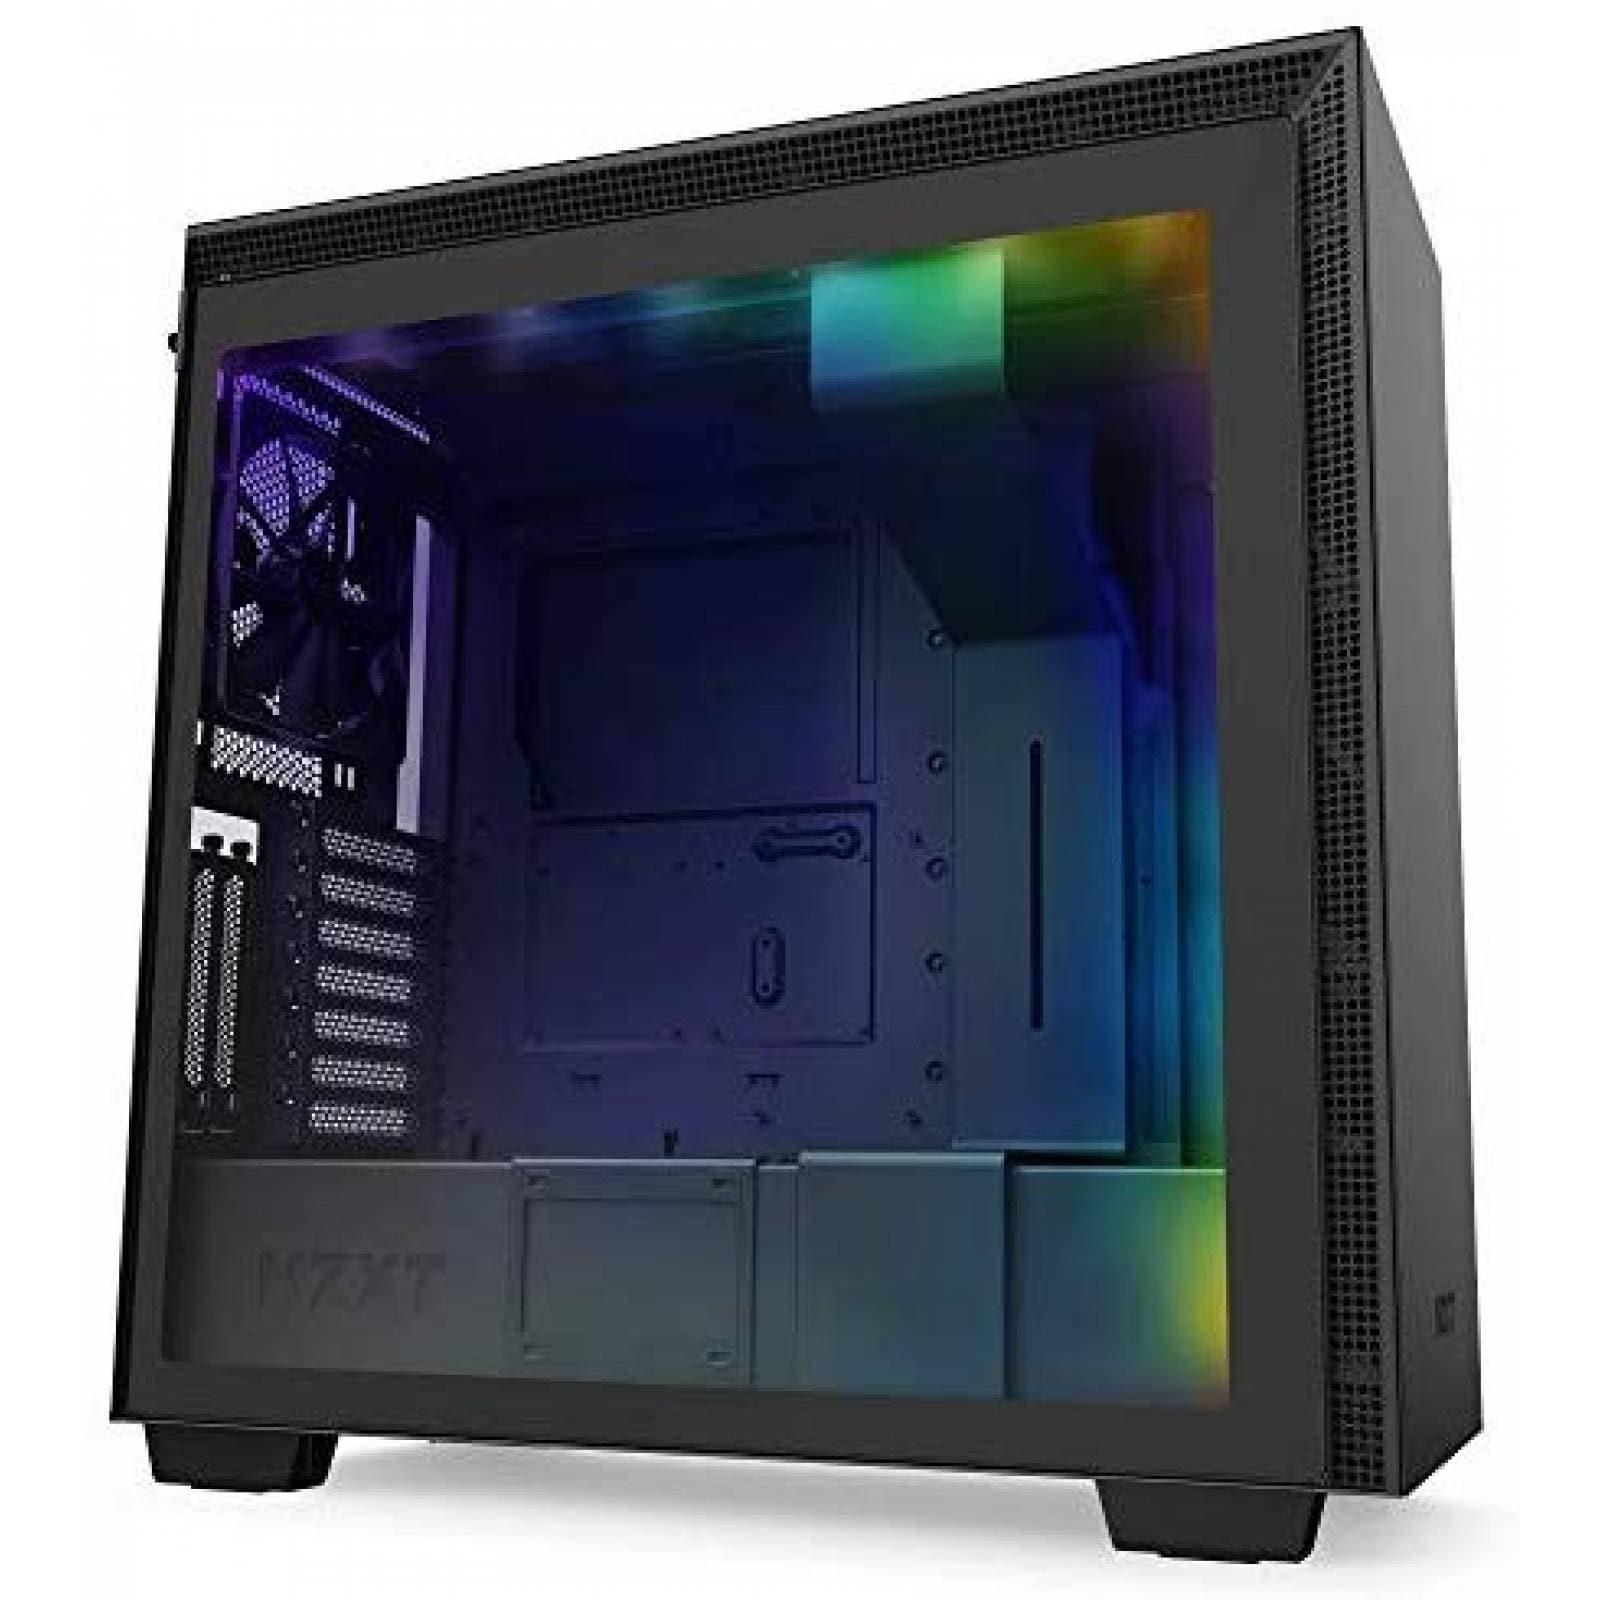 Carcasa para CPU NZXT H710i i-Series GPU Vertical -Negro